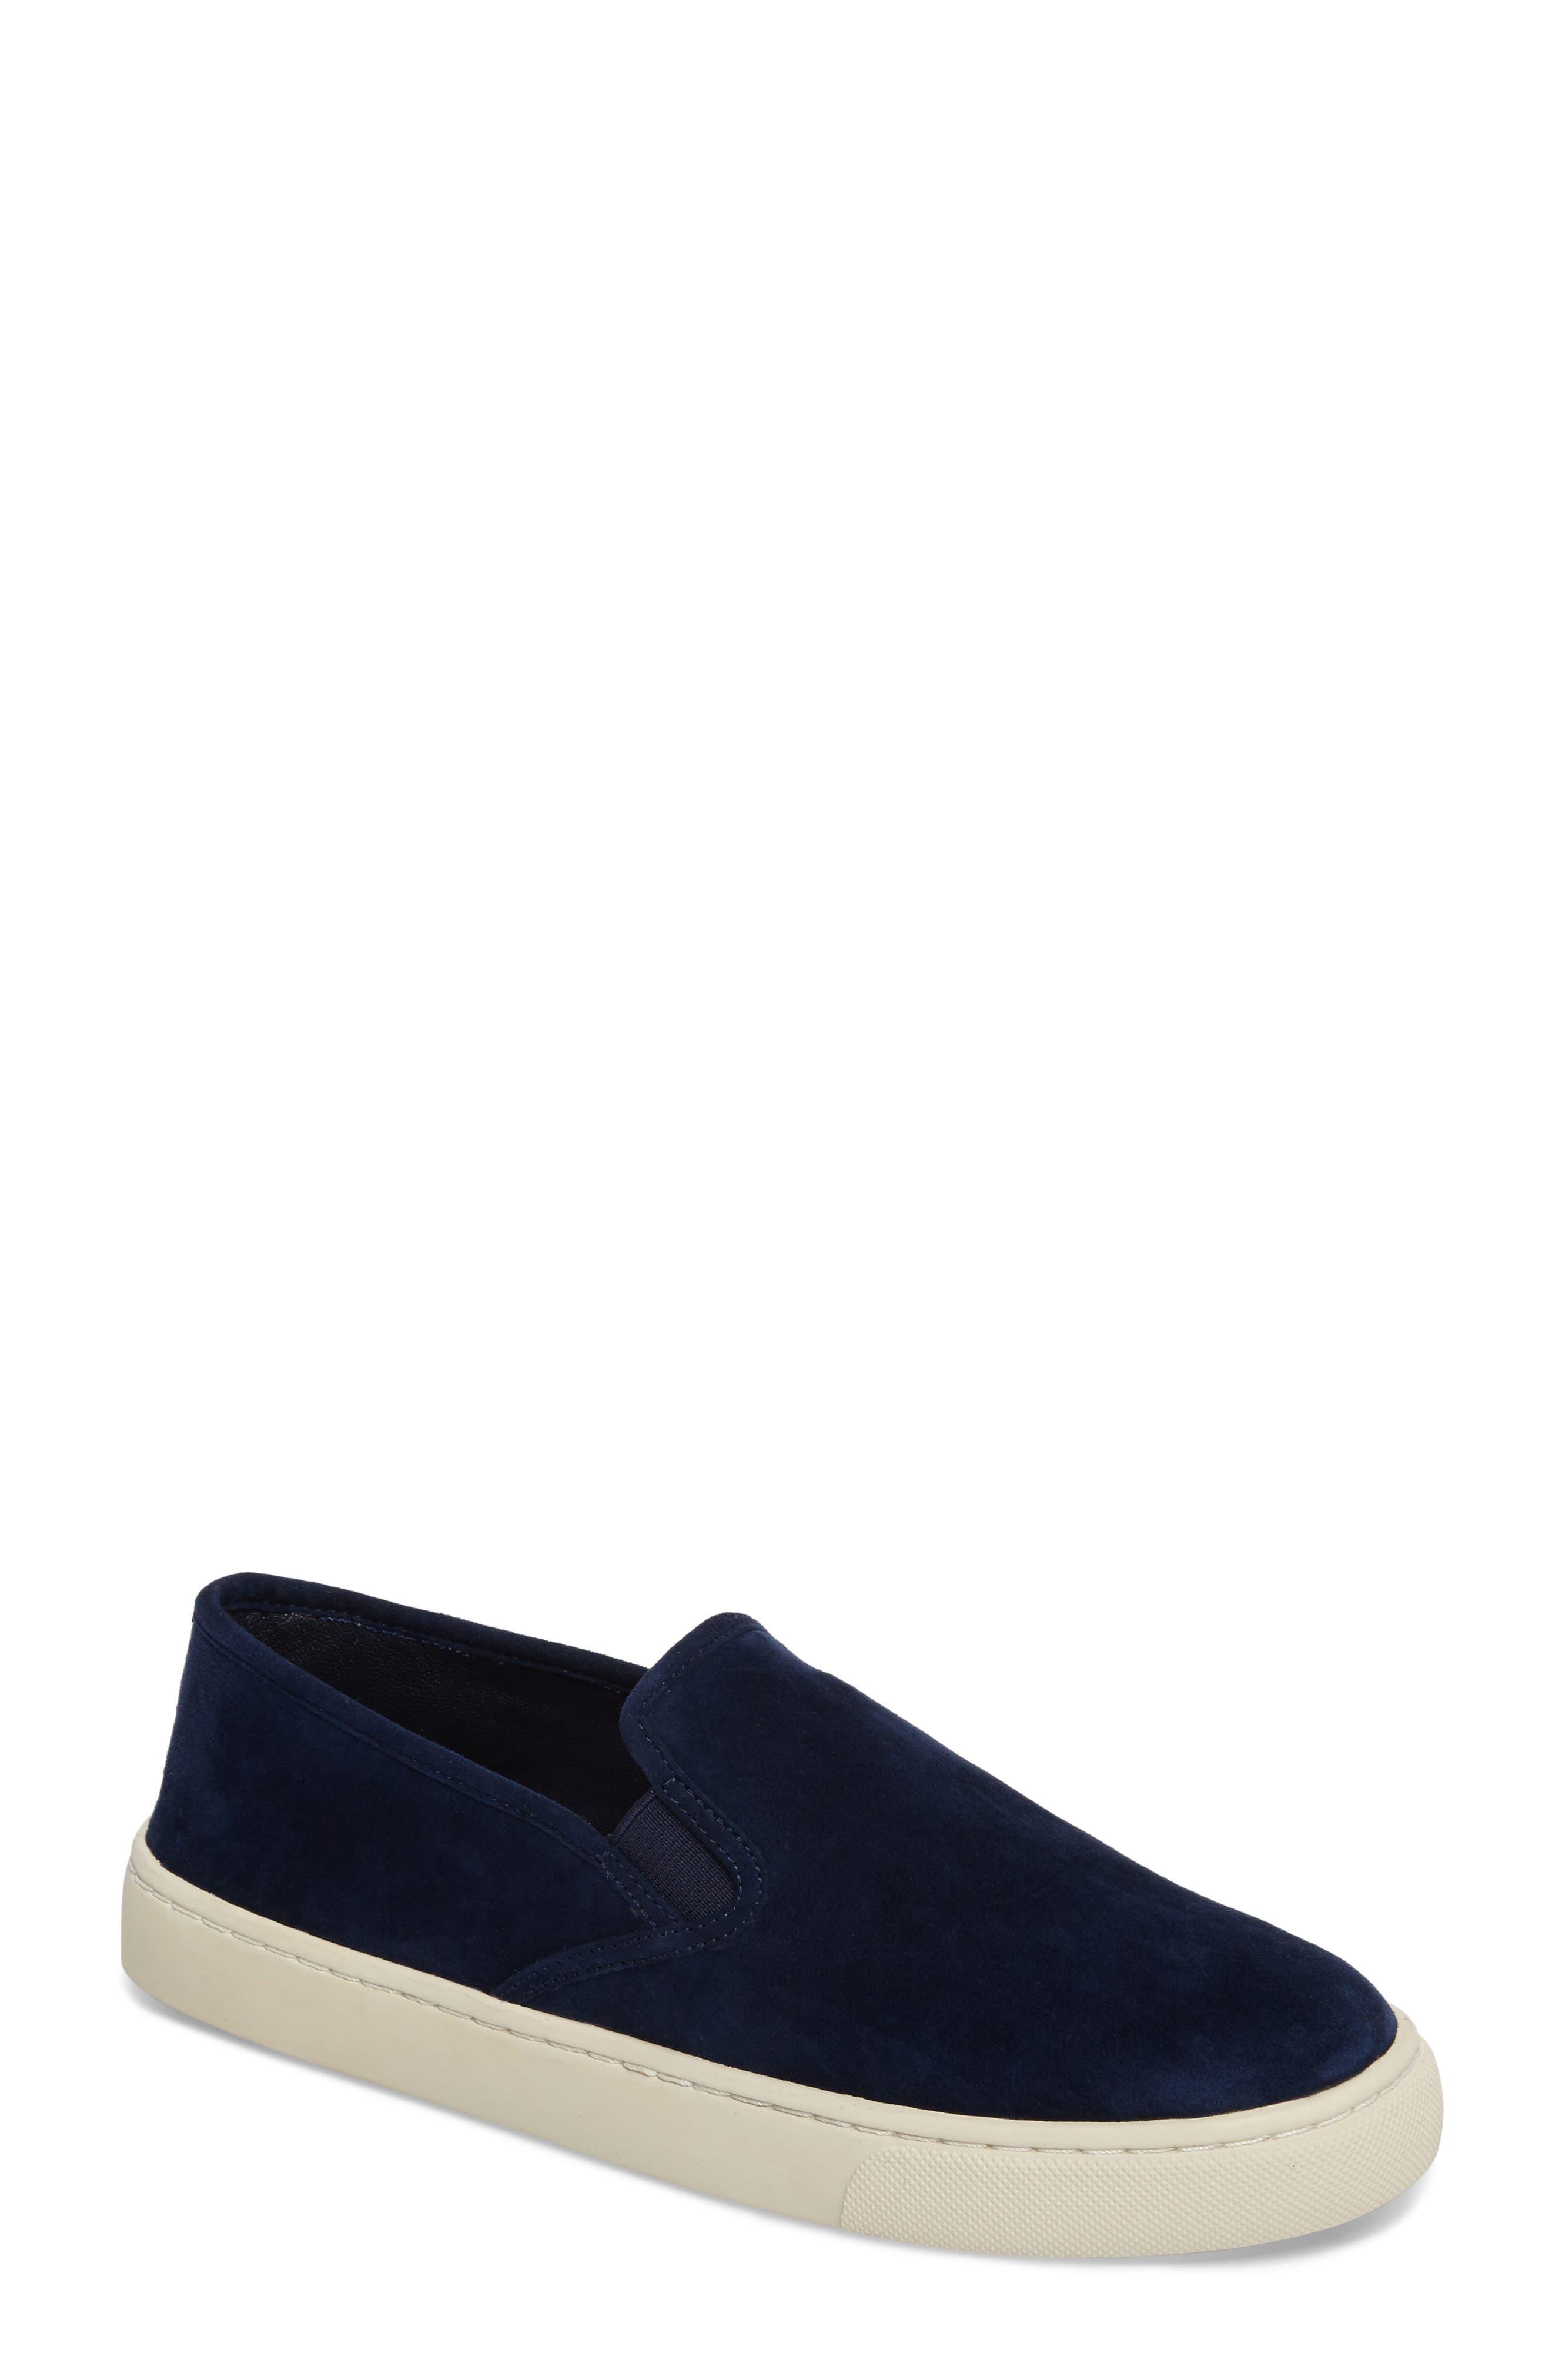 Max Slip-On Sneaker,                             Main thumbnail 4, color,